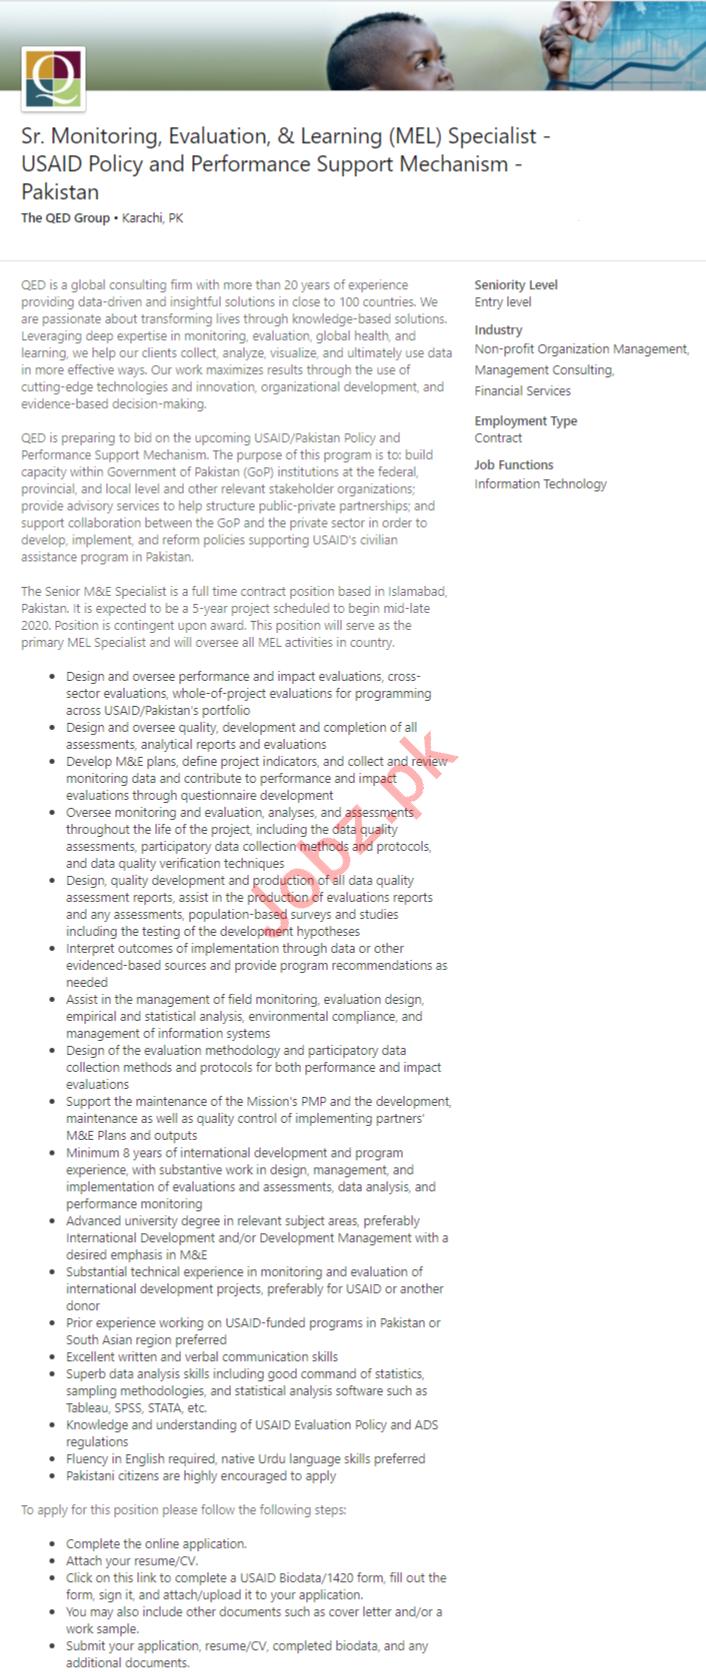 Sr Monitoring Evaluation & Learning MEL Specialist Job 2020